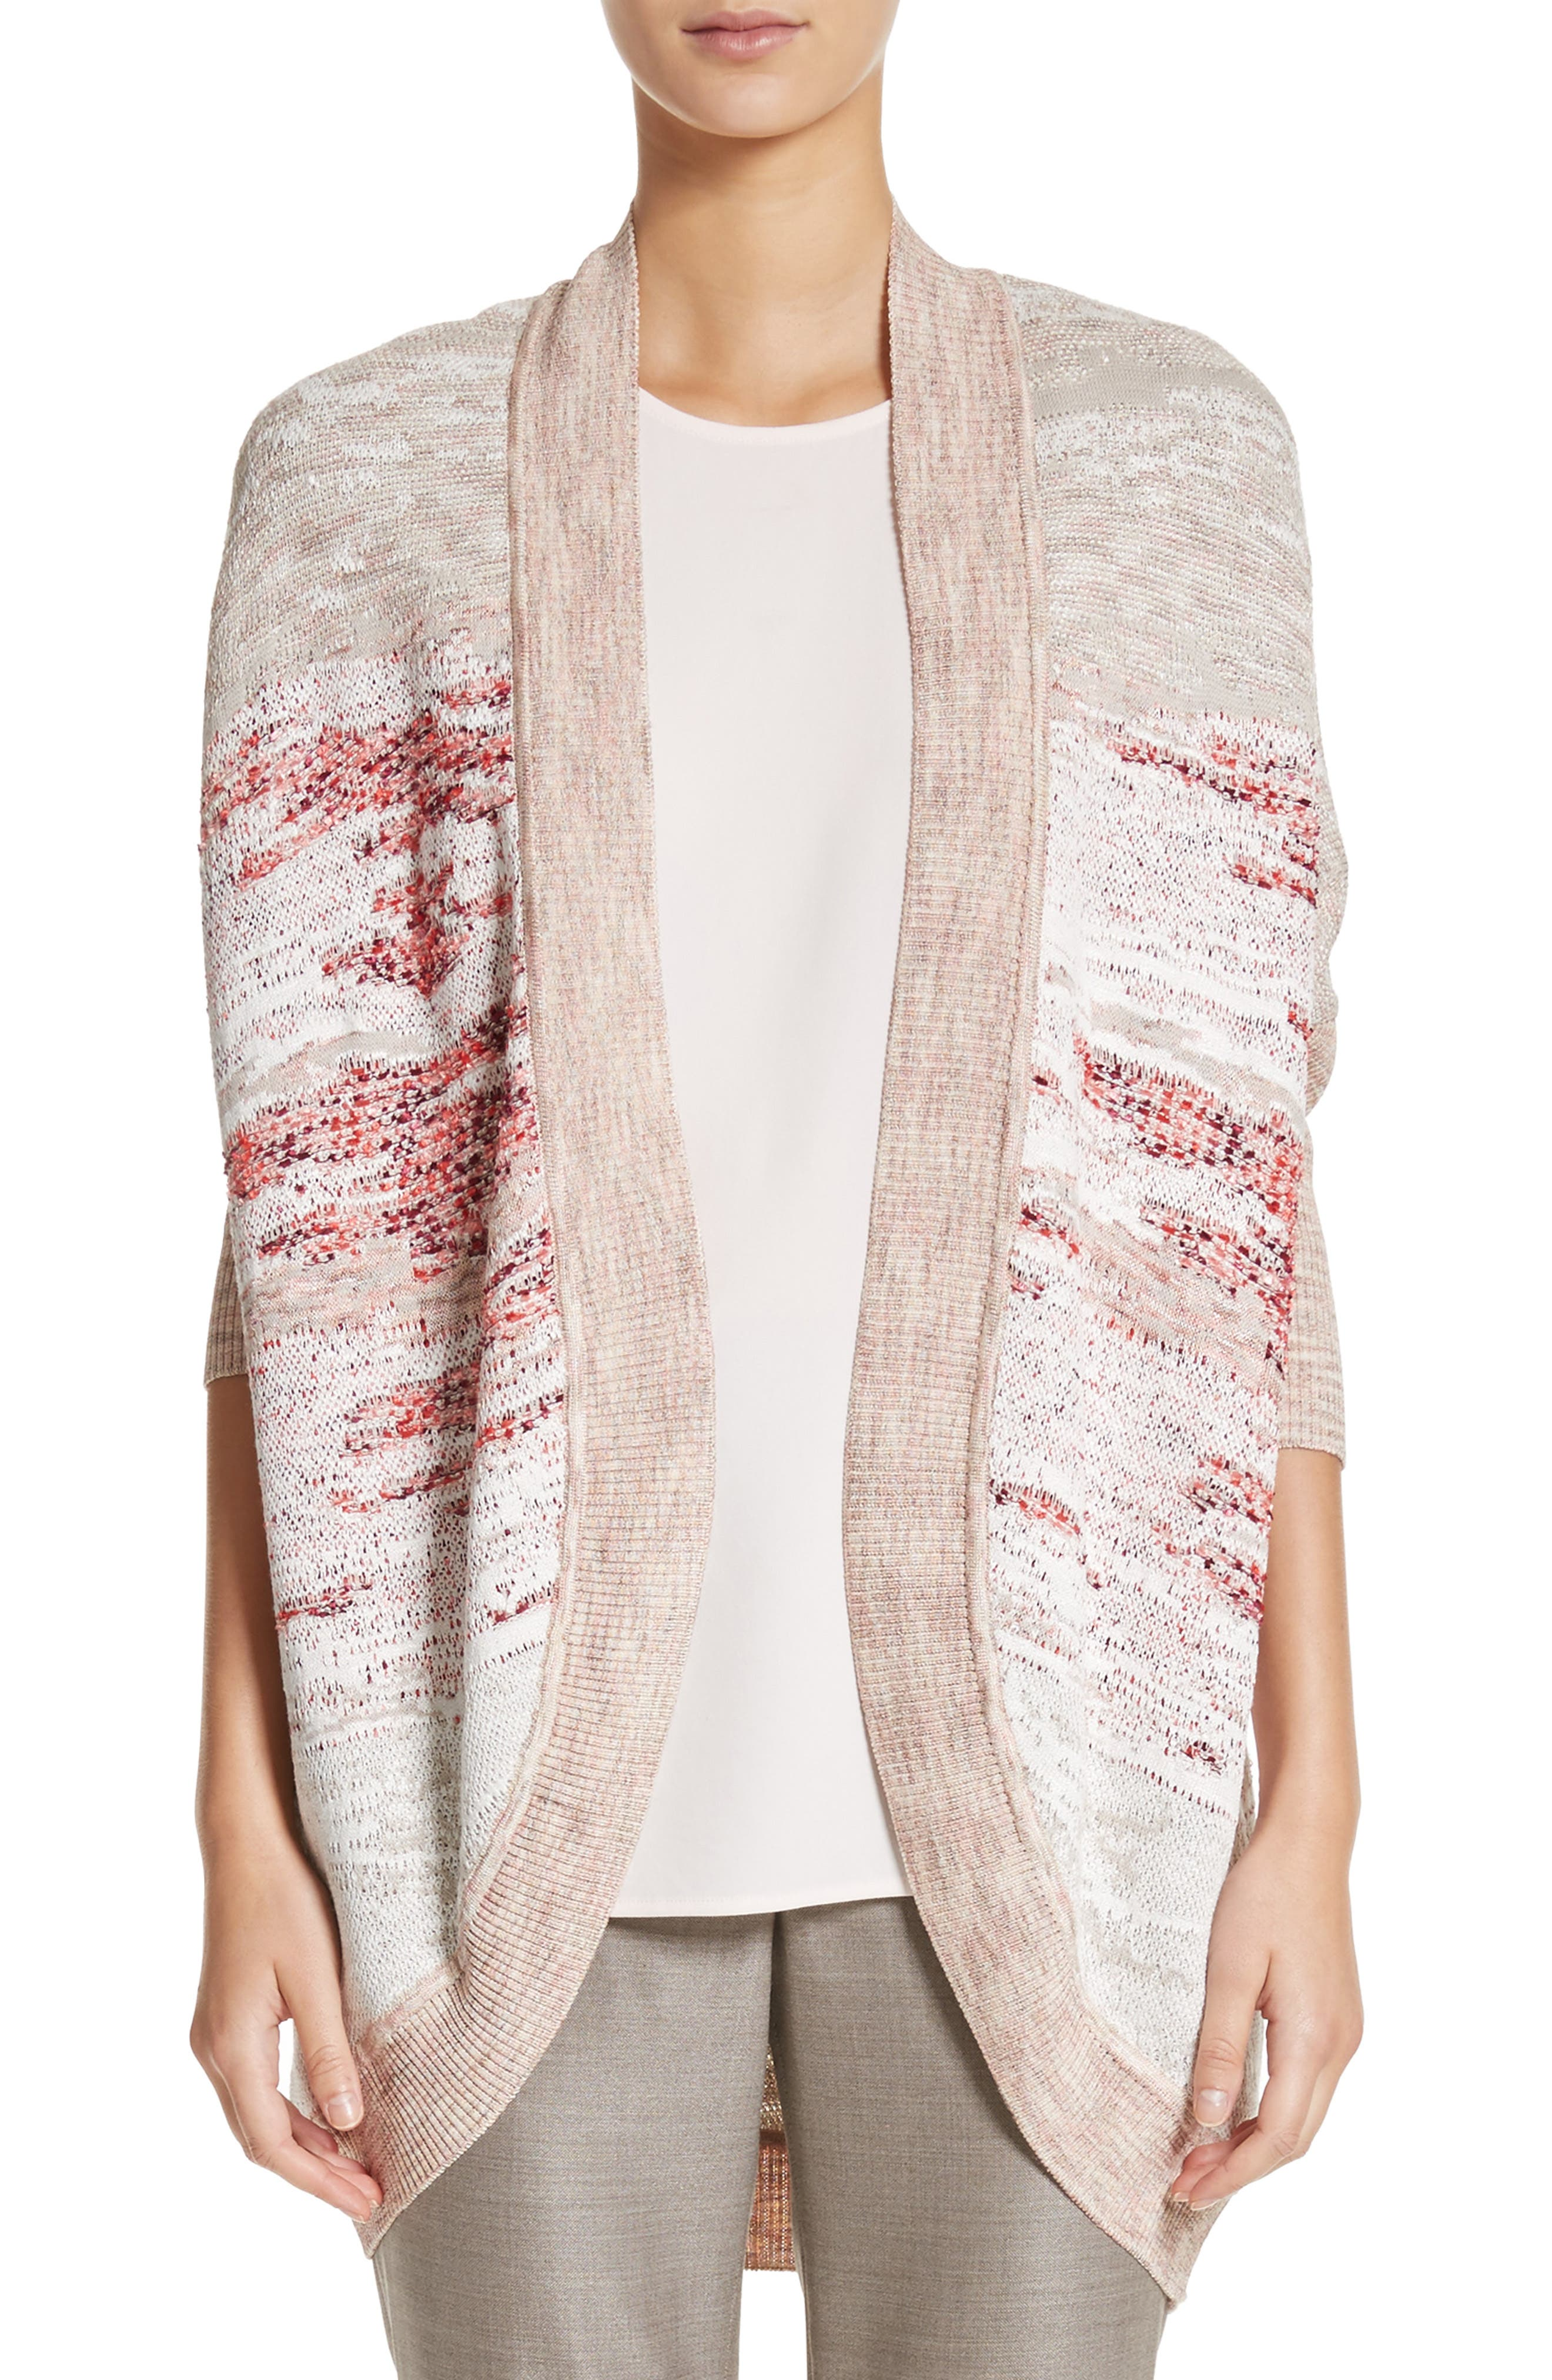 Ombré Textured Jacquard Knit Cardigan,                         Main,                         color, 050